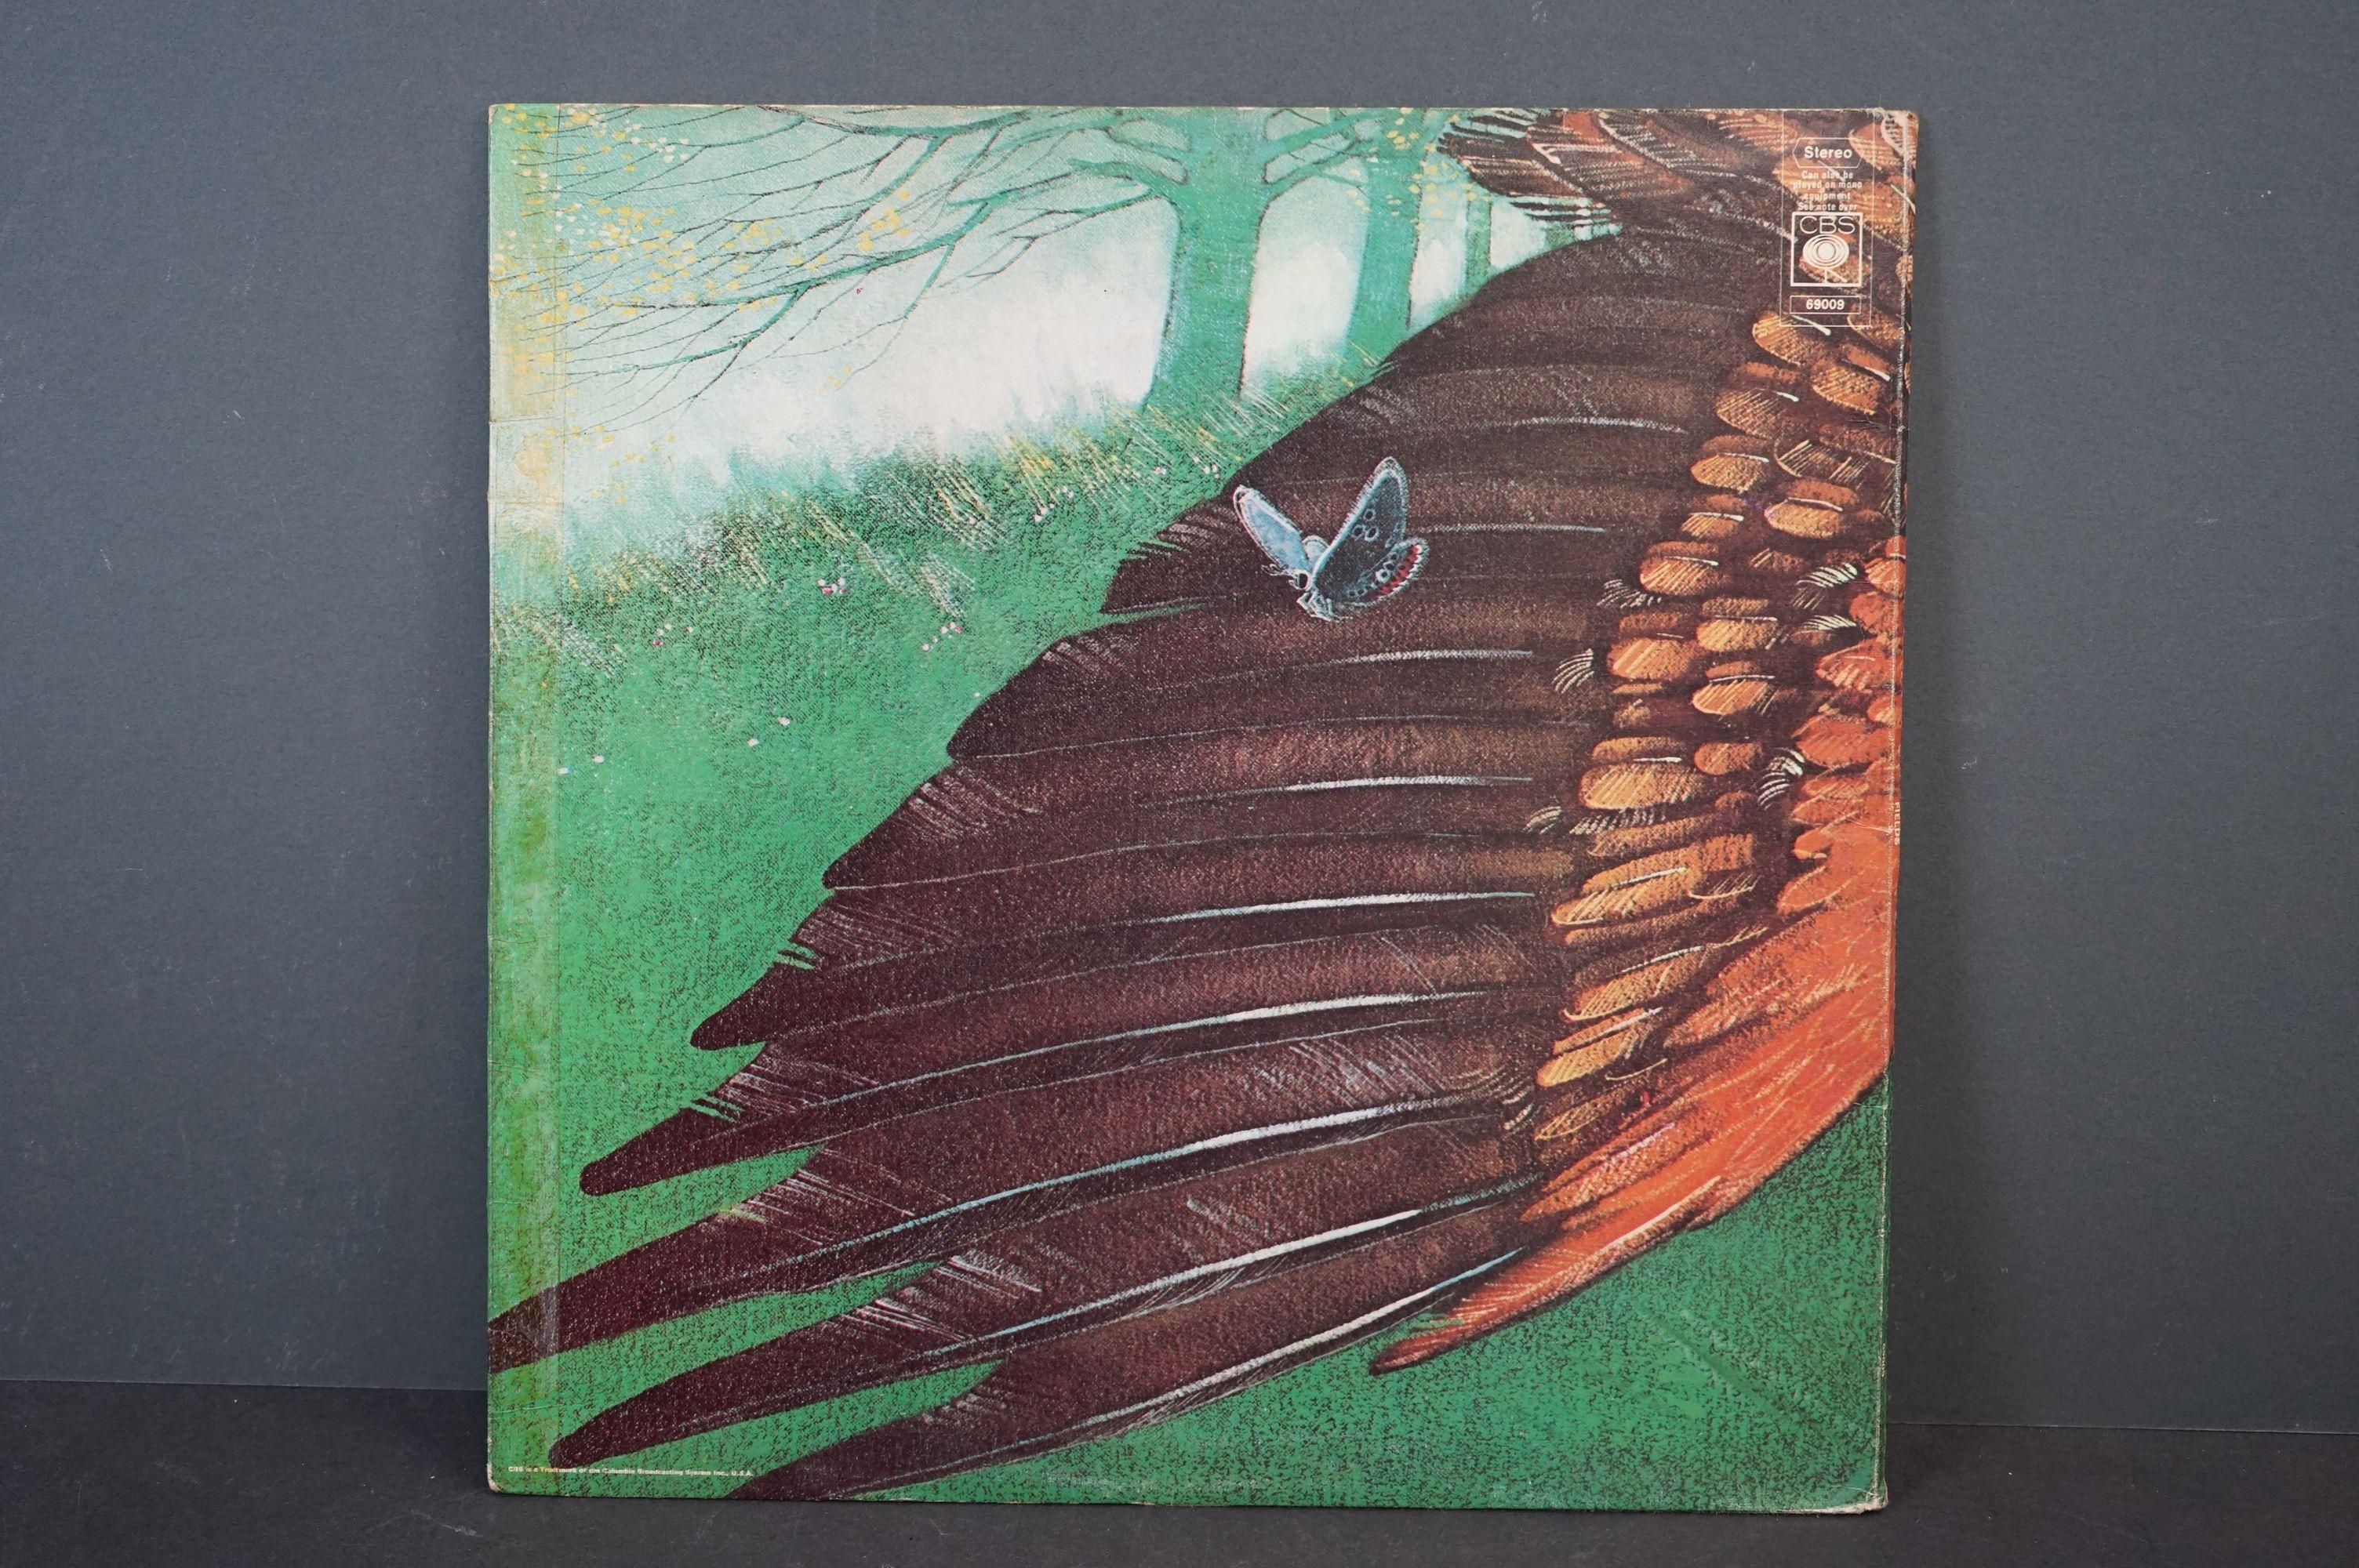 Vinyl - Prog Rock - Fields - Fields. UK 1st 1971 pressing with scarce poster, gatefold sleeve is - Image 6 of 6